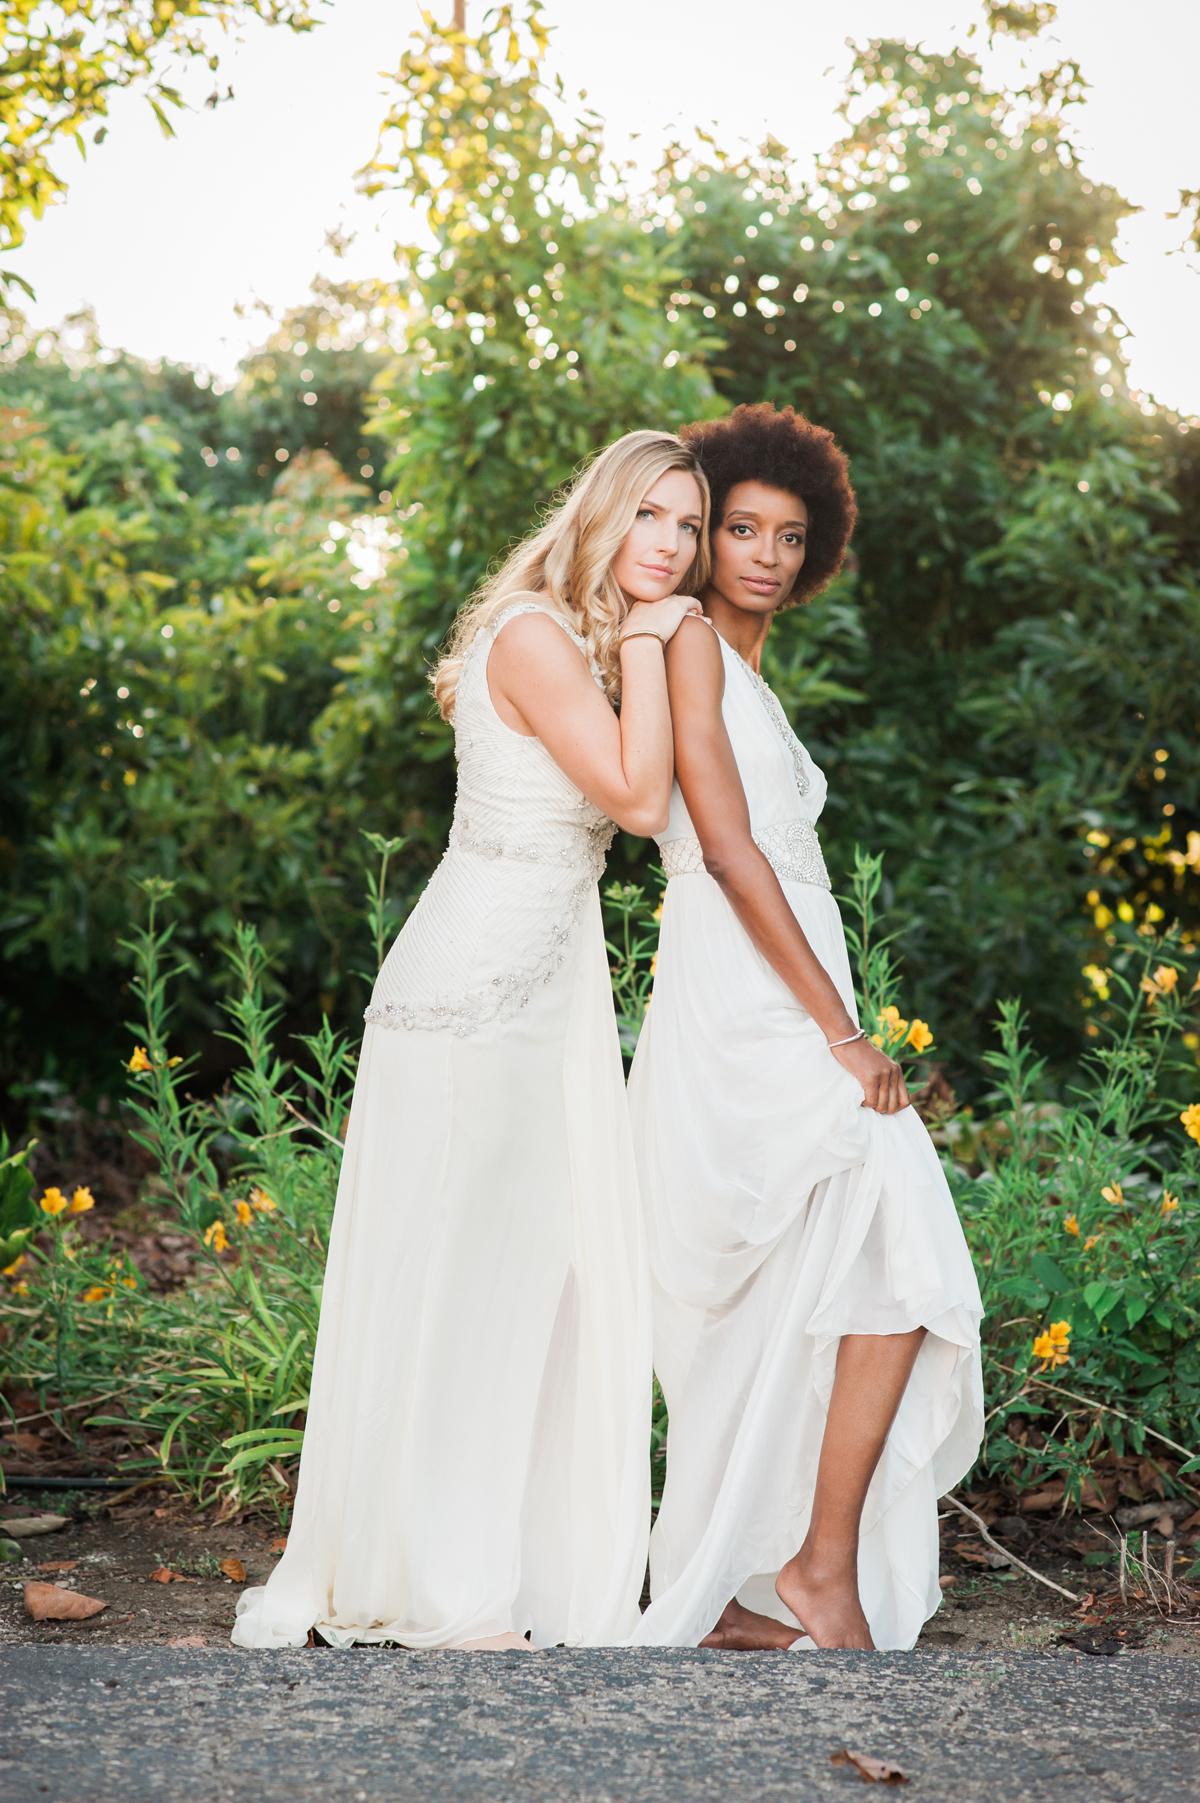 Lavender + Berry Wedding Inspiration - Elizabeth Anne Designs: The ...